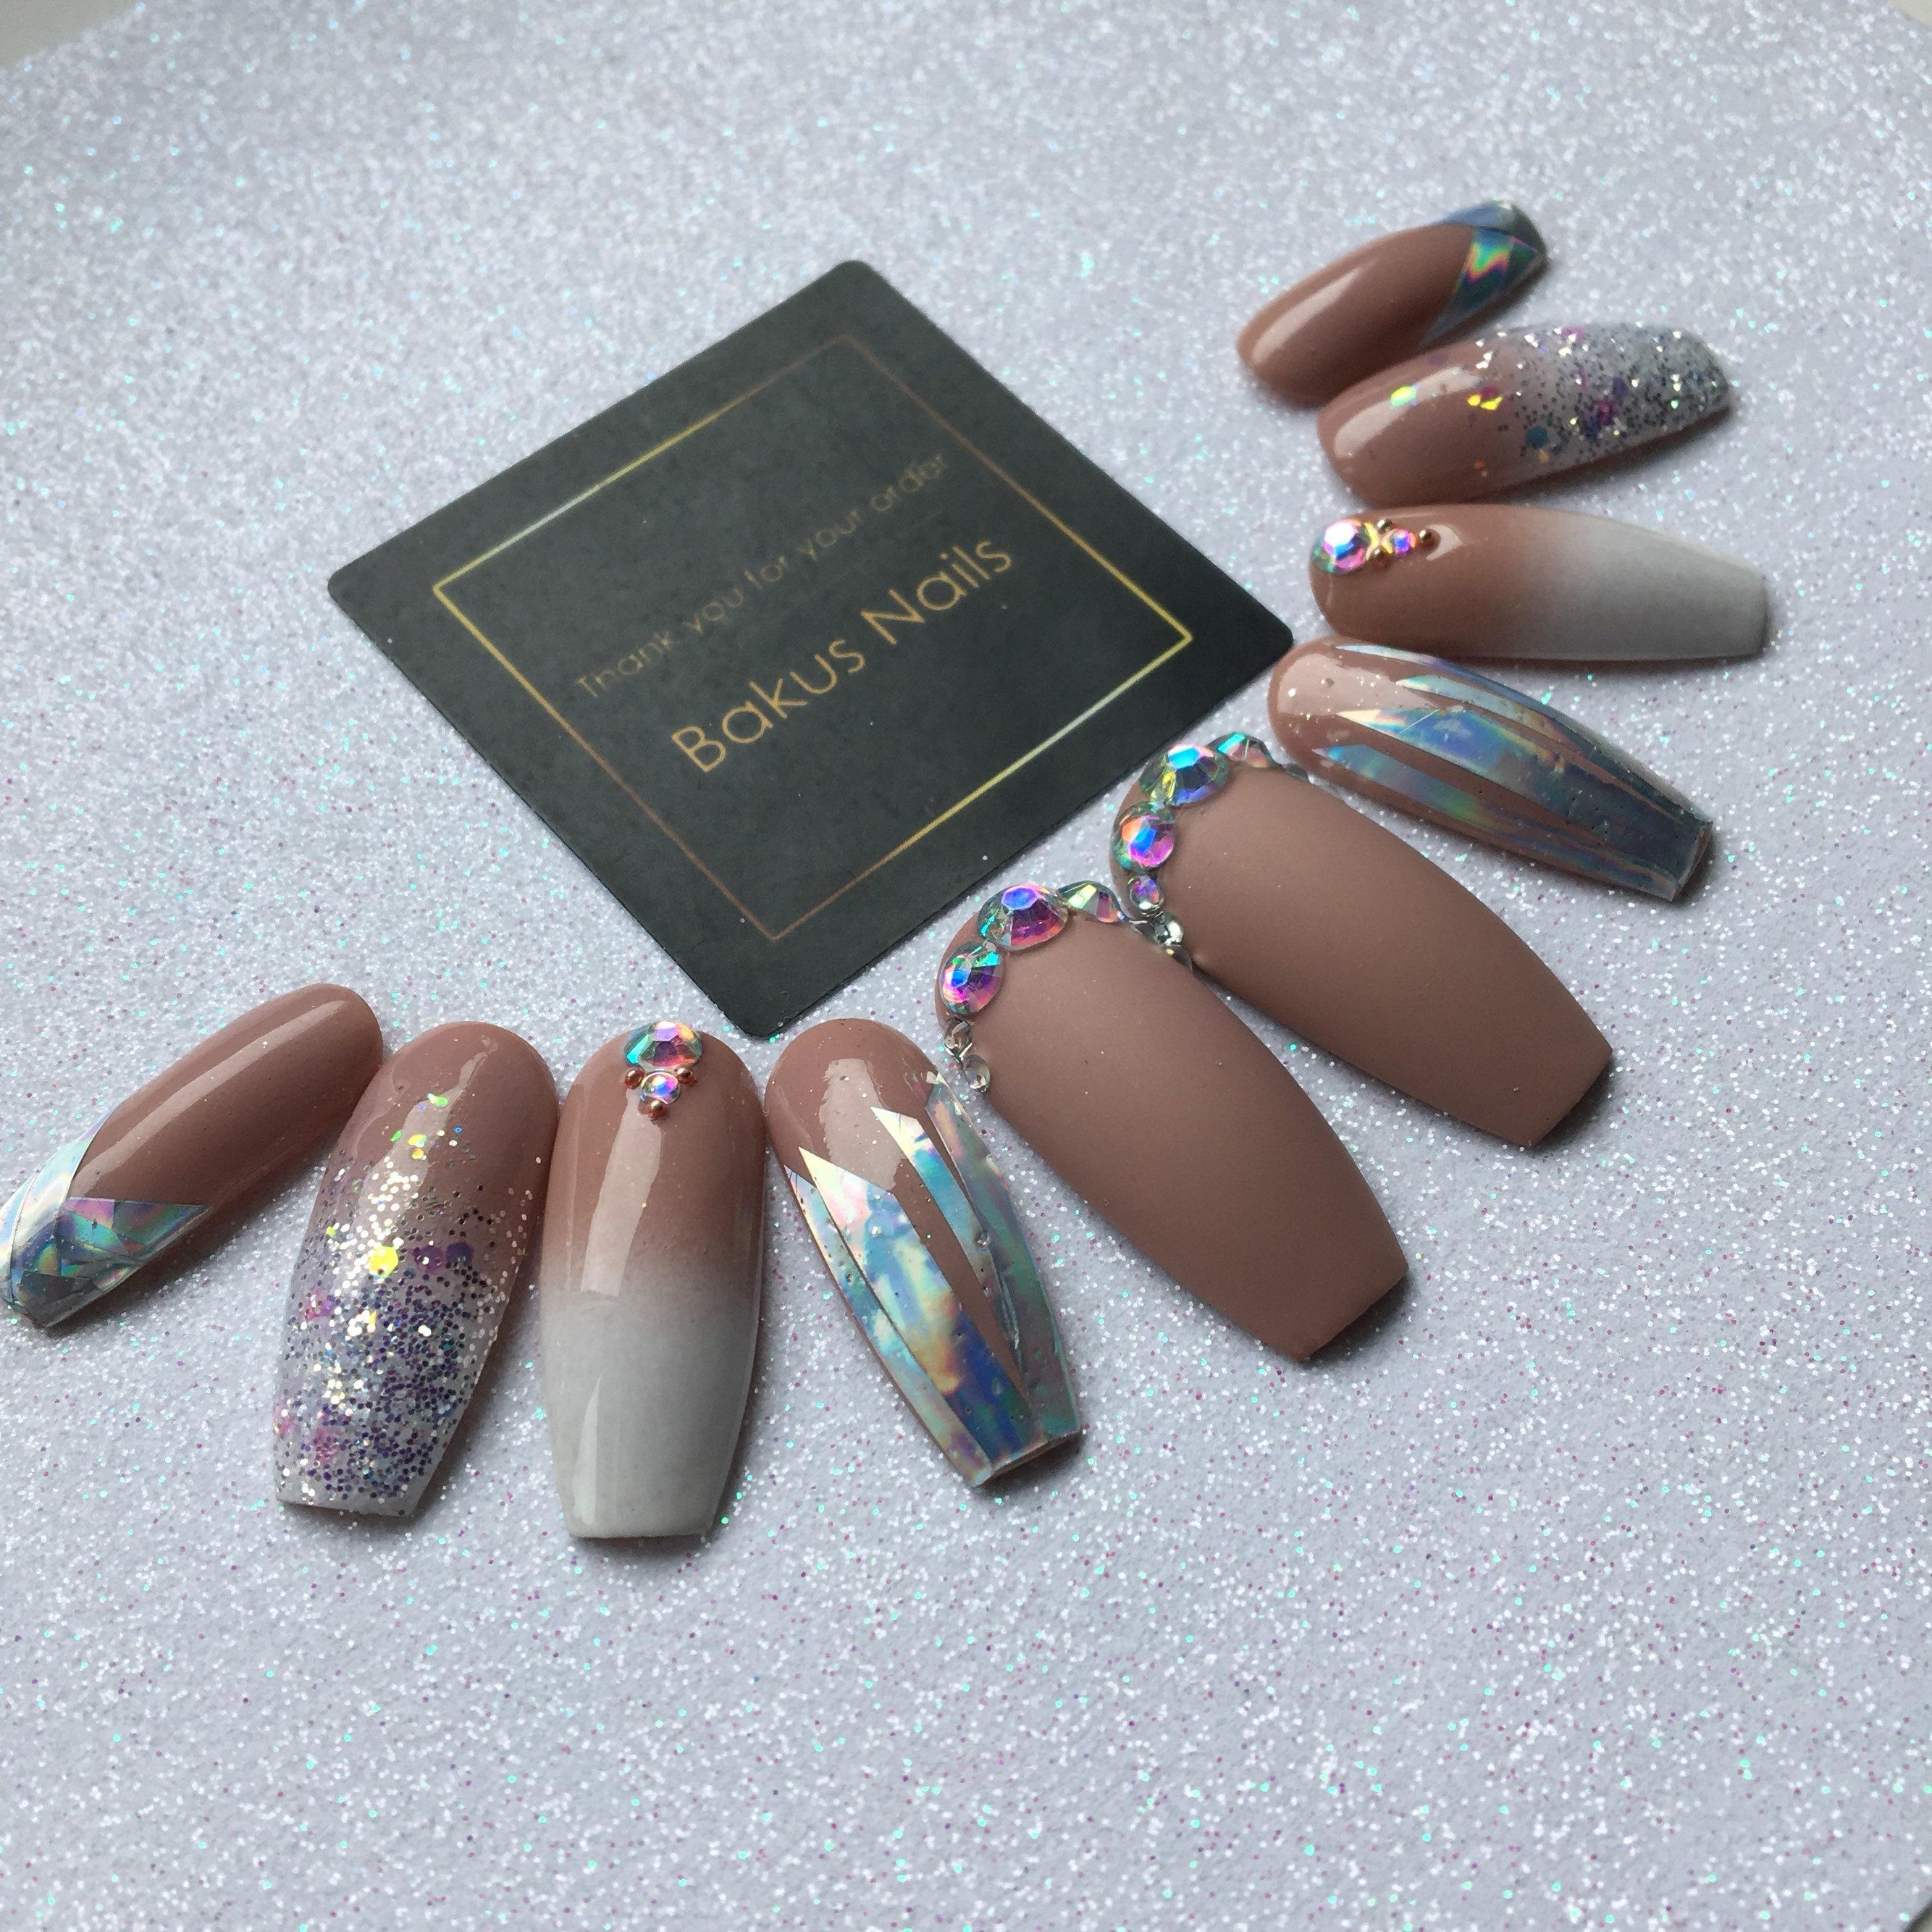 Hamd Painted press on nails false nails long coffin shape nude ...